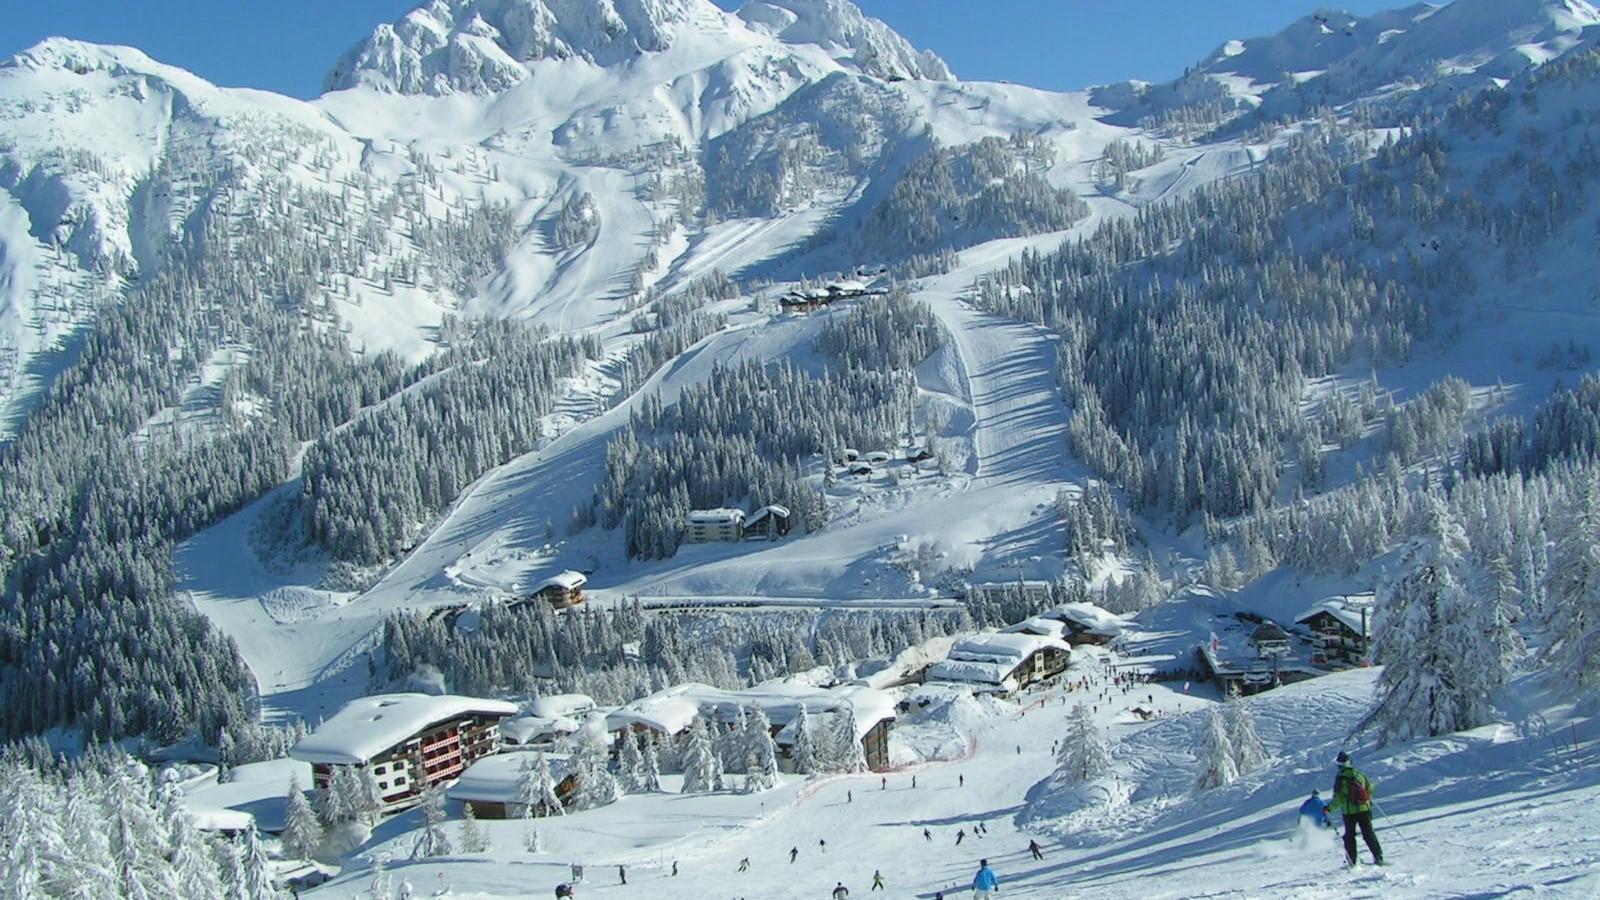 Bakuriani, Ski Resort in Georgia